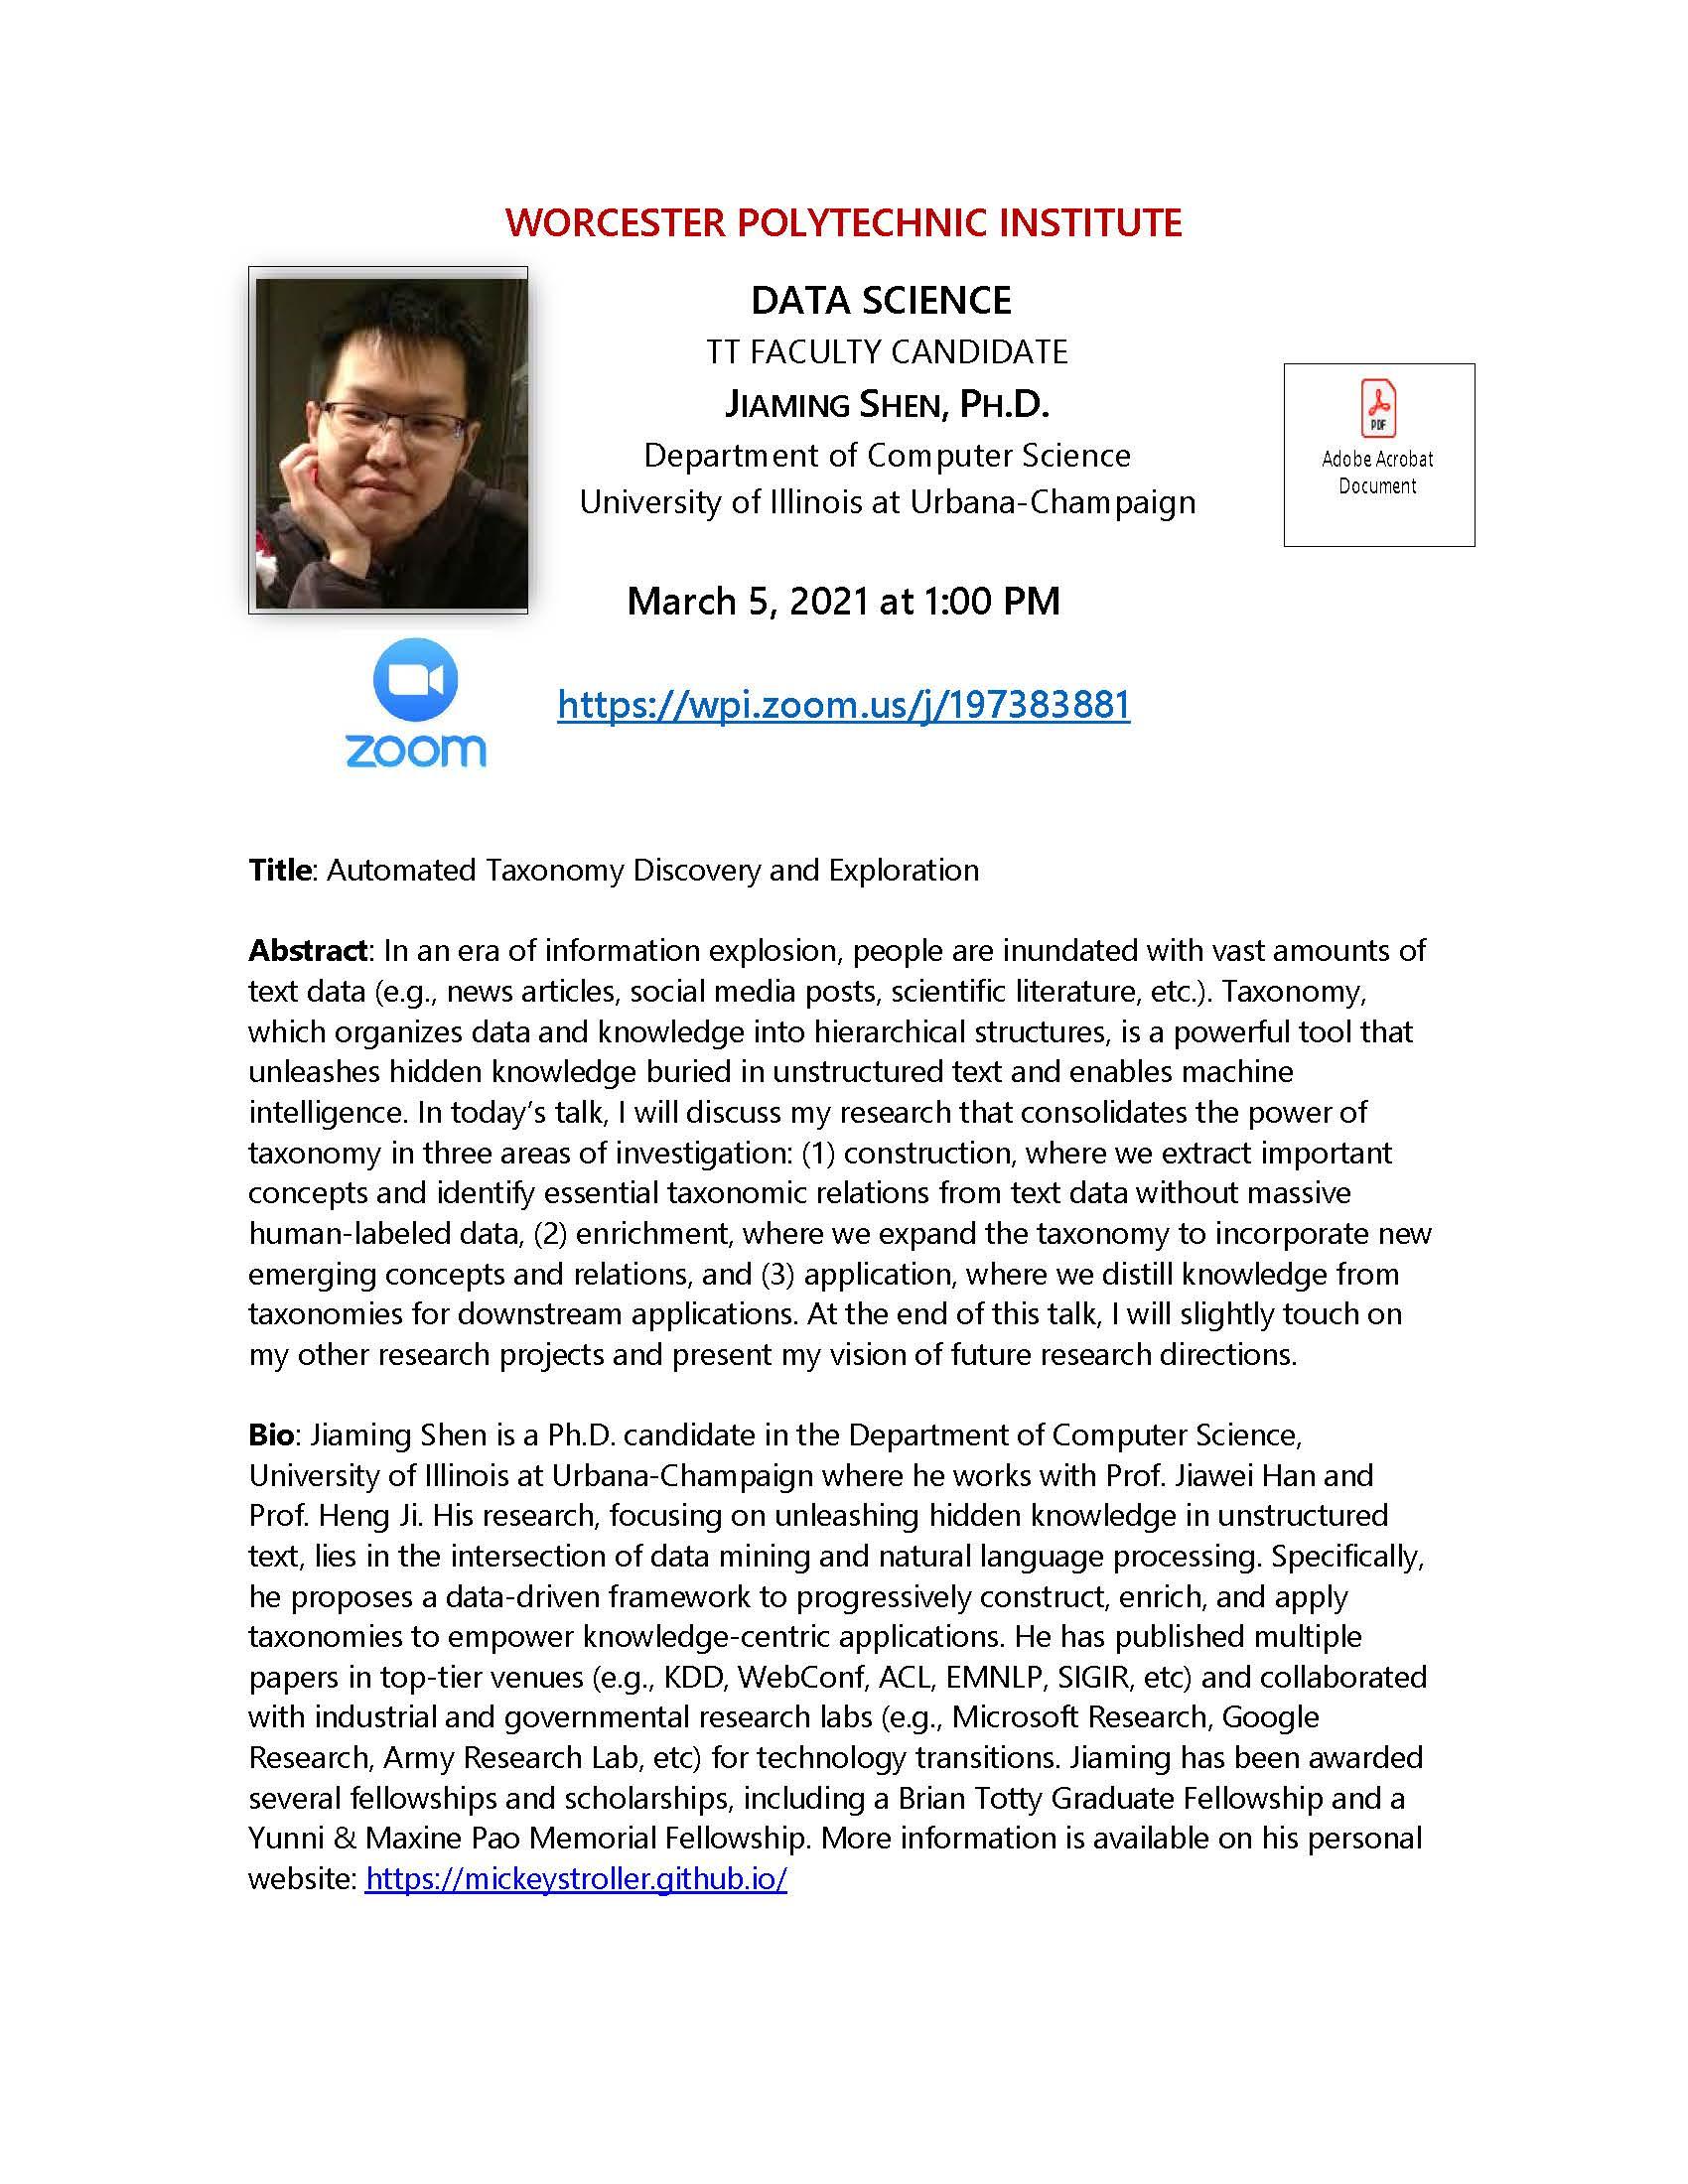 Jiaming Shen Presentation doc.jpg alt